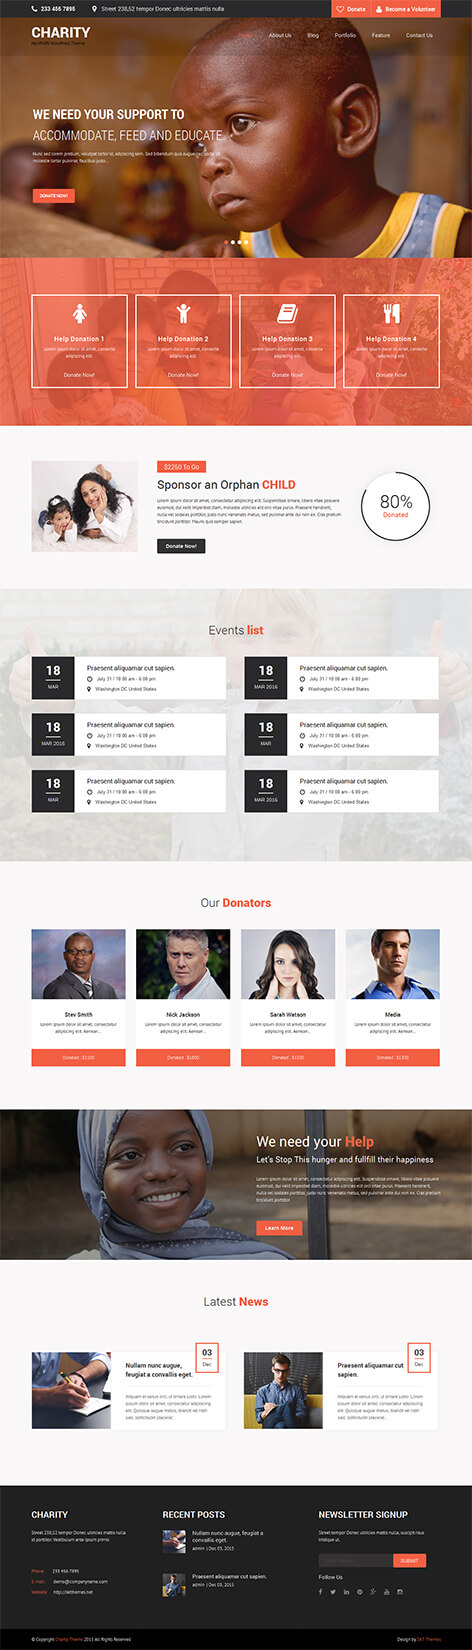 charity wordpress theme - Charity